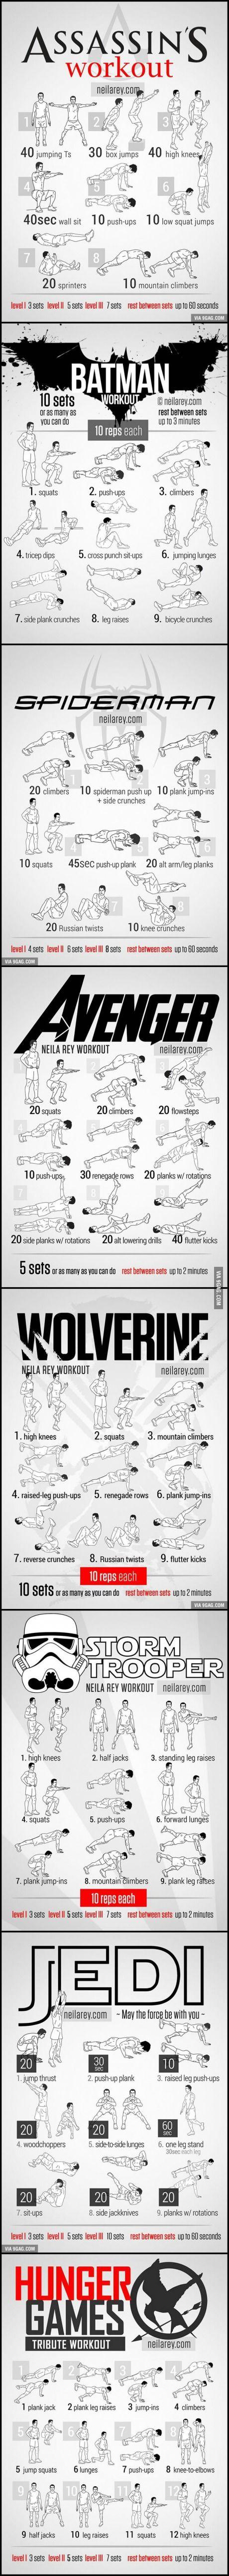 Victory Weight: Workout for Assassin, Batman, Spiderman, Avenger, ...